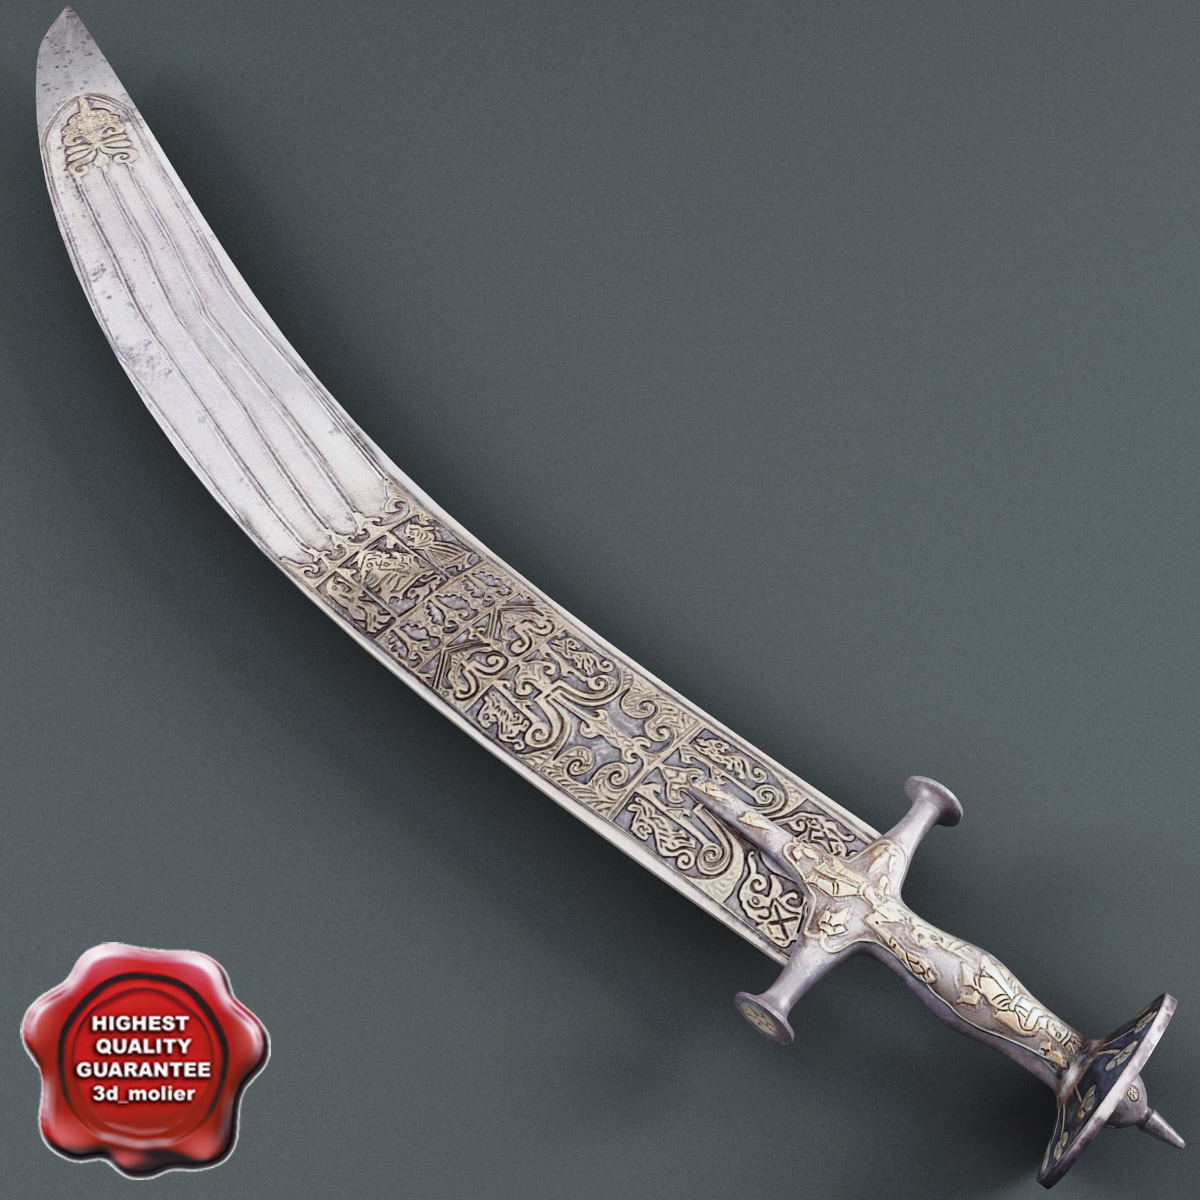 Indian_Sword_00.jpg